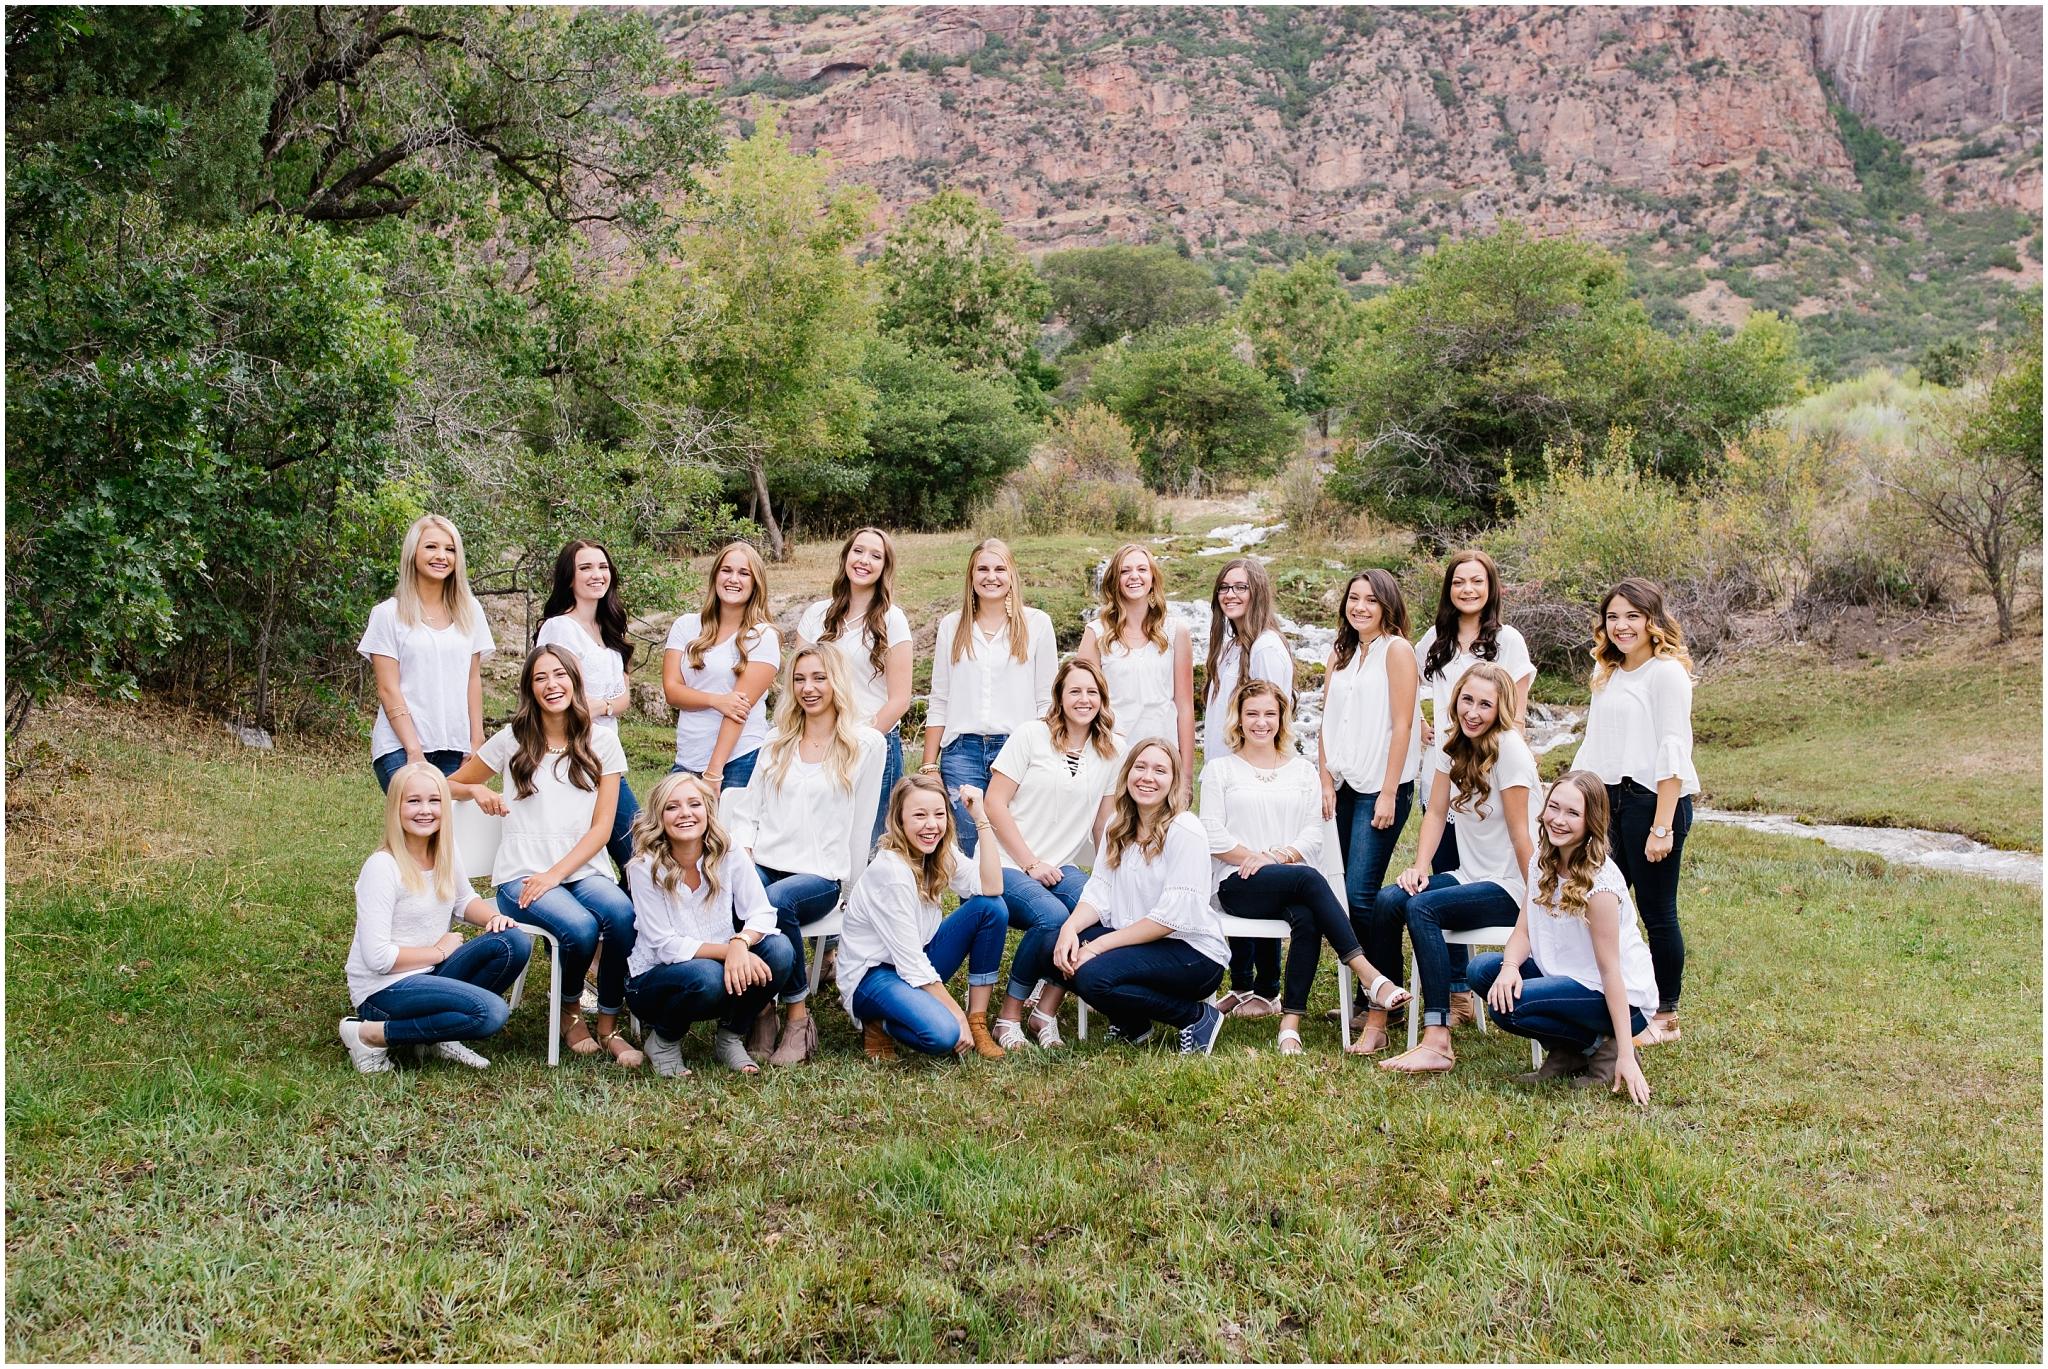 GVHSDRILL-4_Lizzie-B-Imagery-Utah-Family-Photographer-Central-Utah-Park-City-Salt-Lake-City-Drill-Team-Photography-Dance.jpg